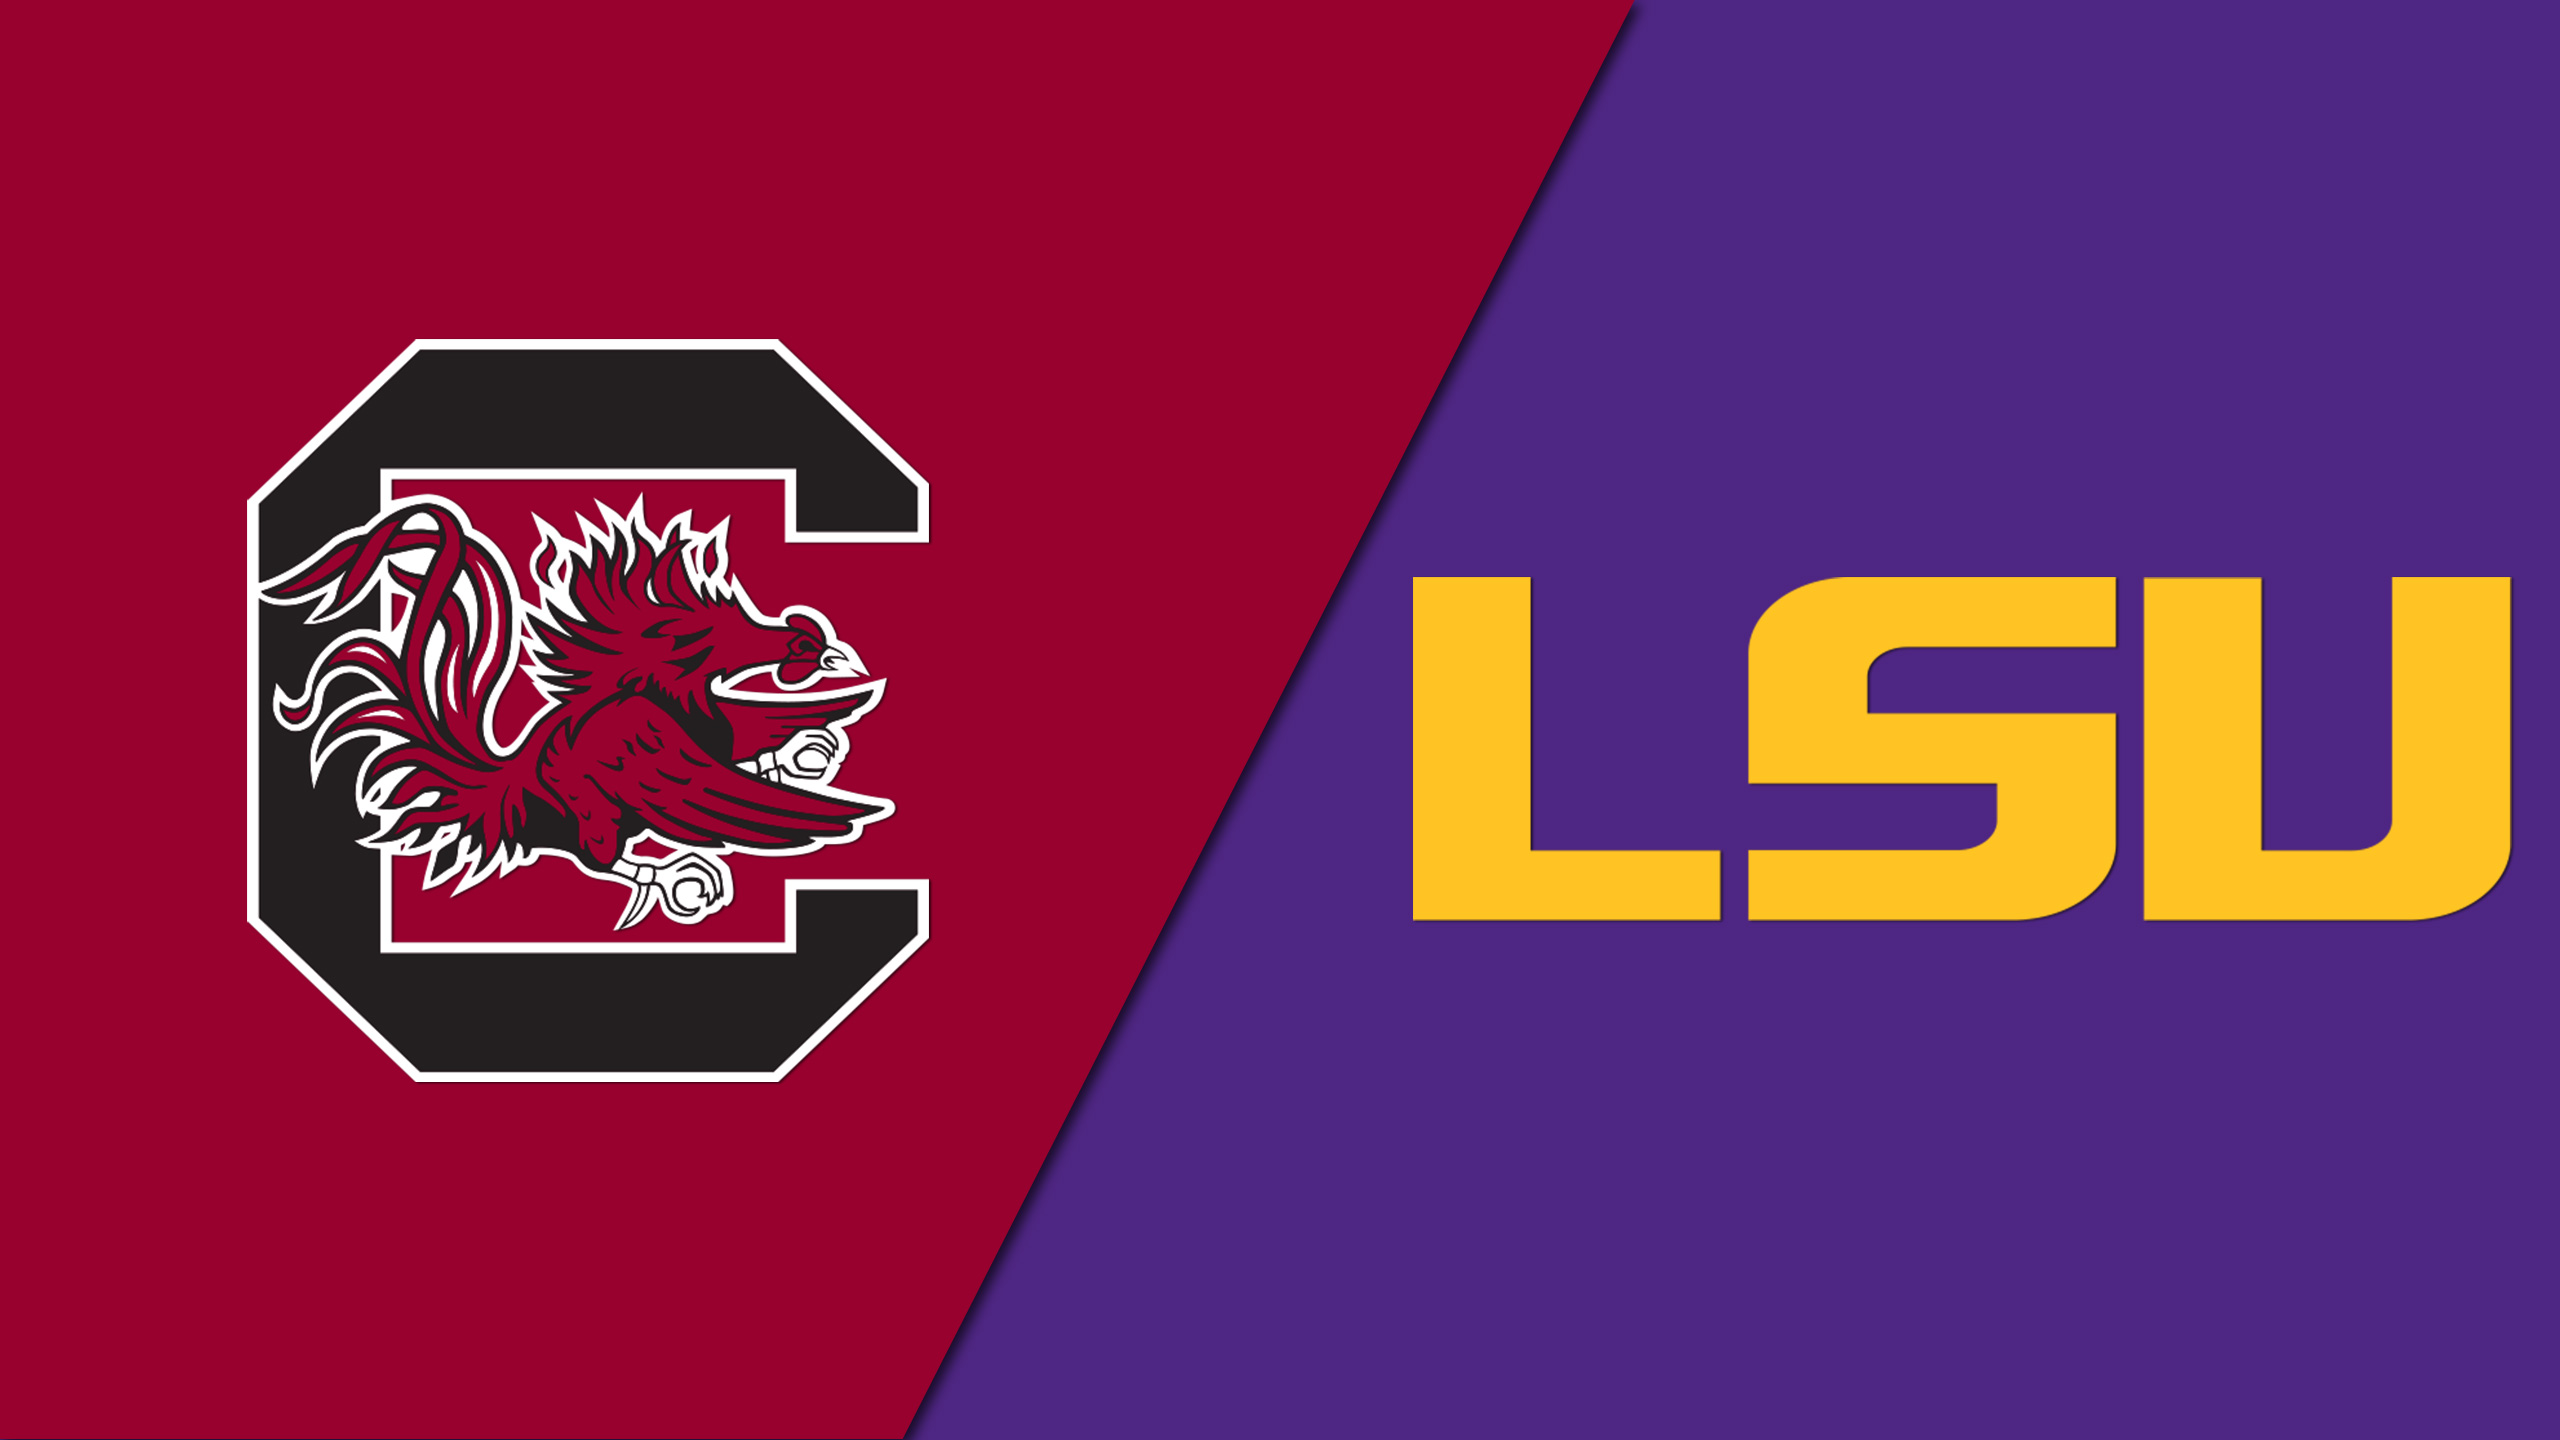 South Carolina vs. LSU (Softball)